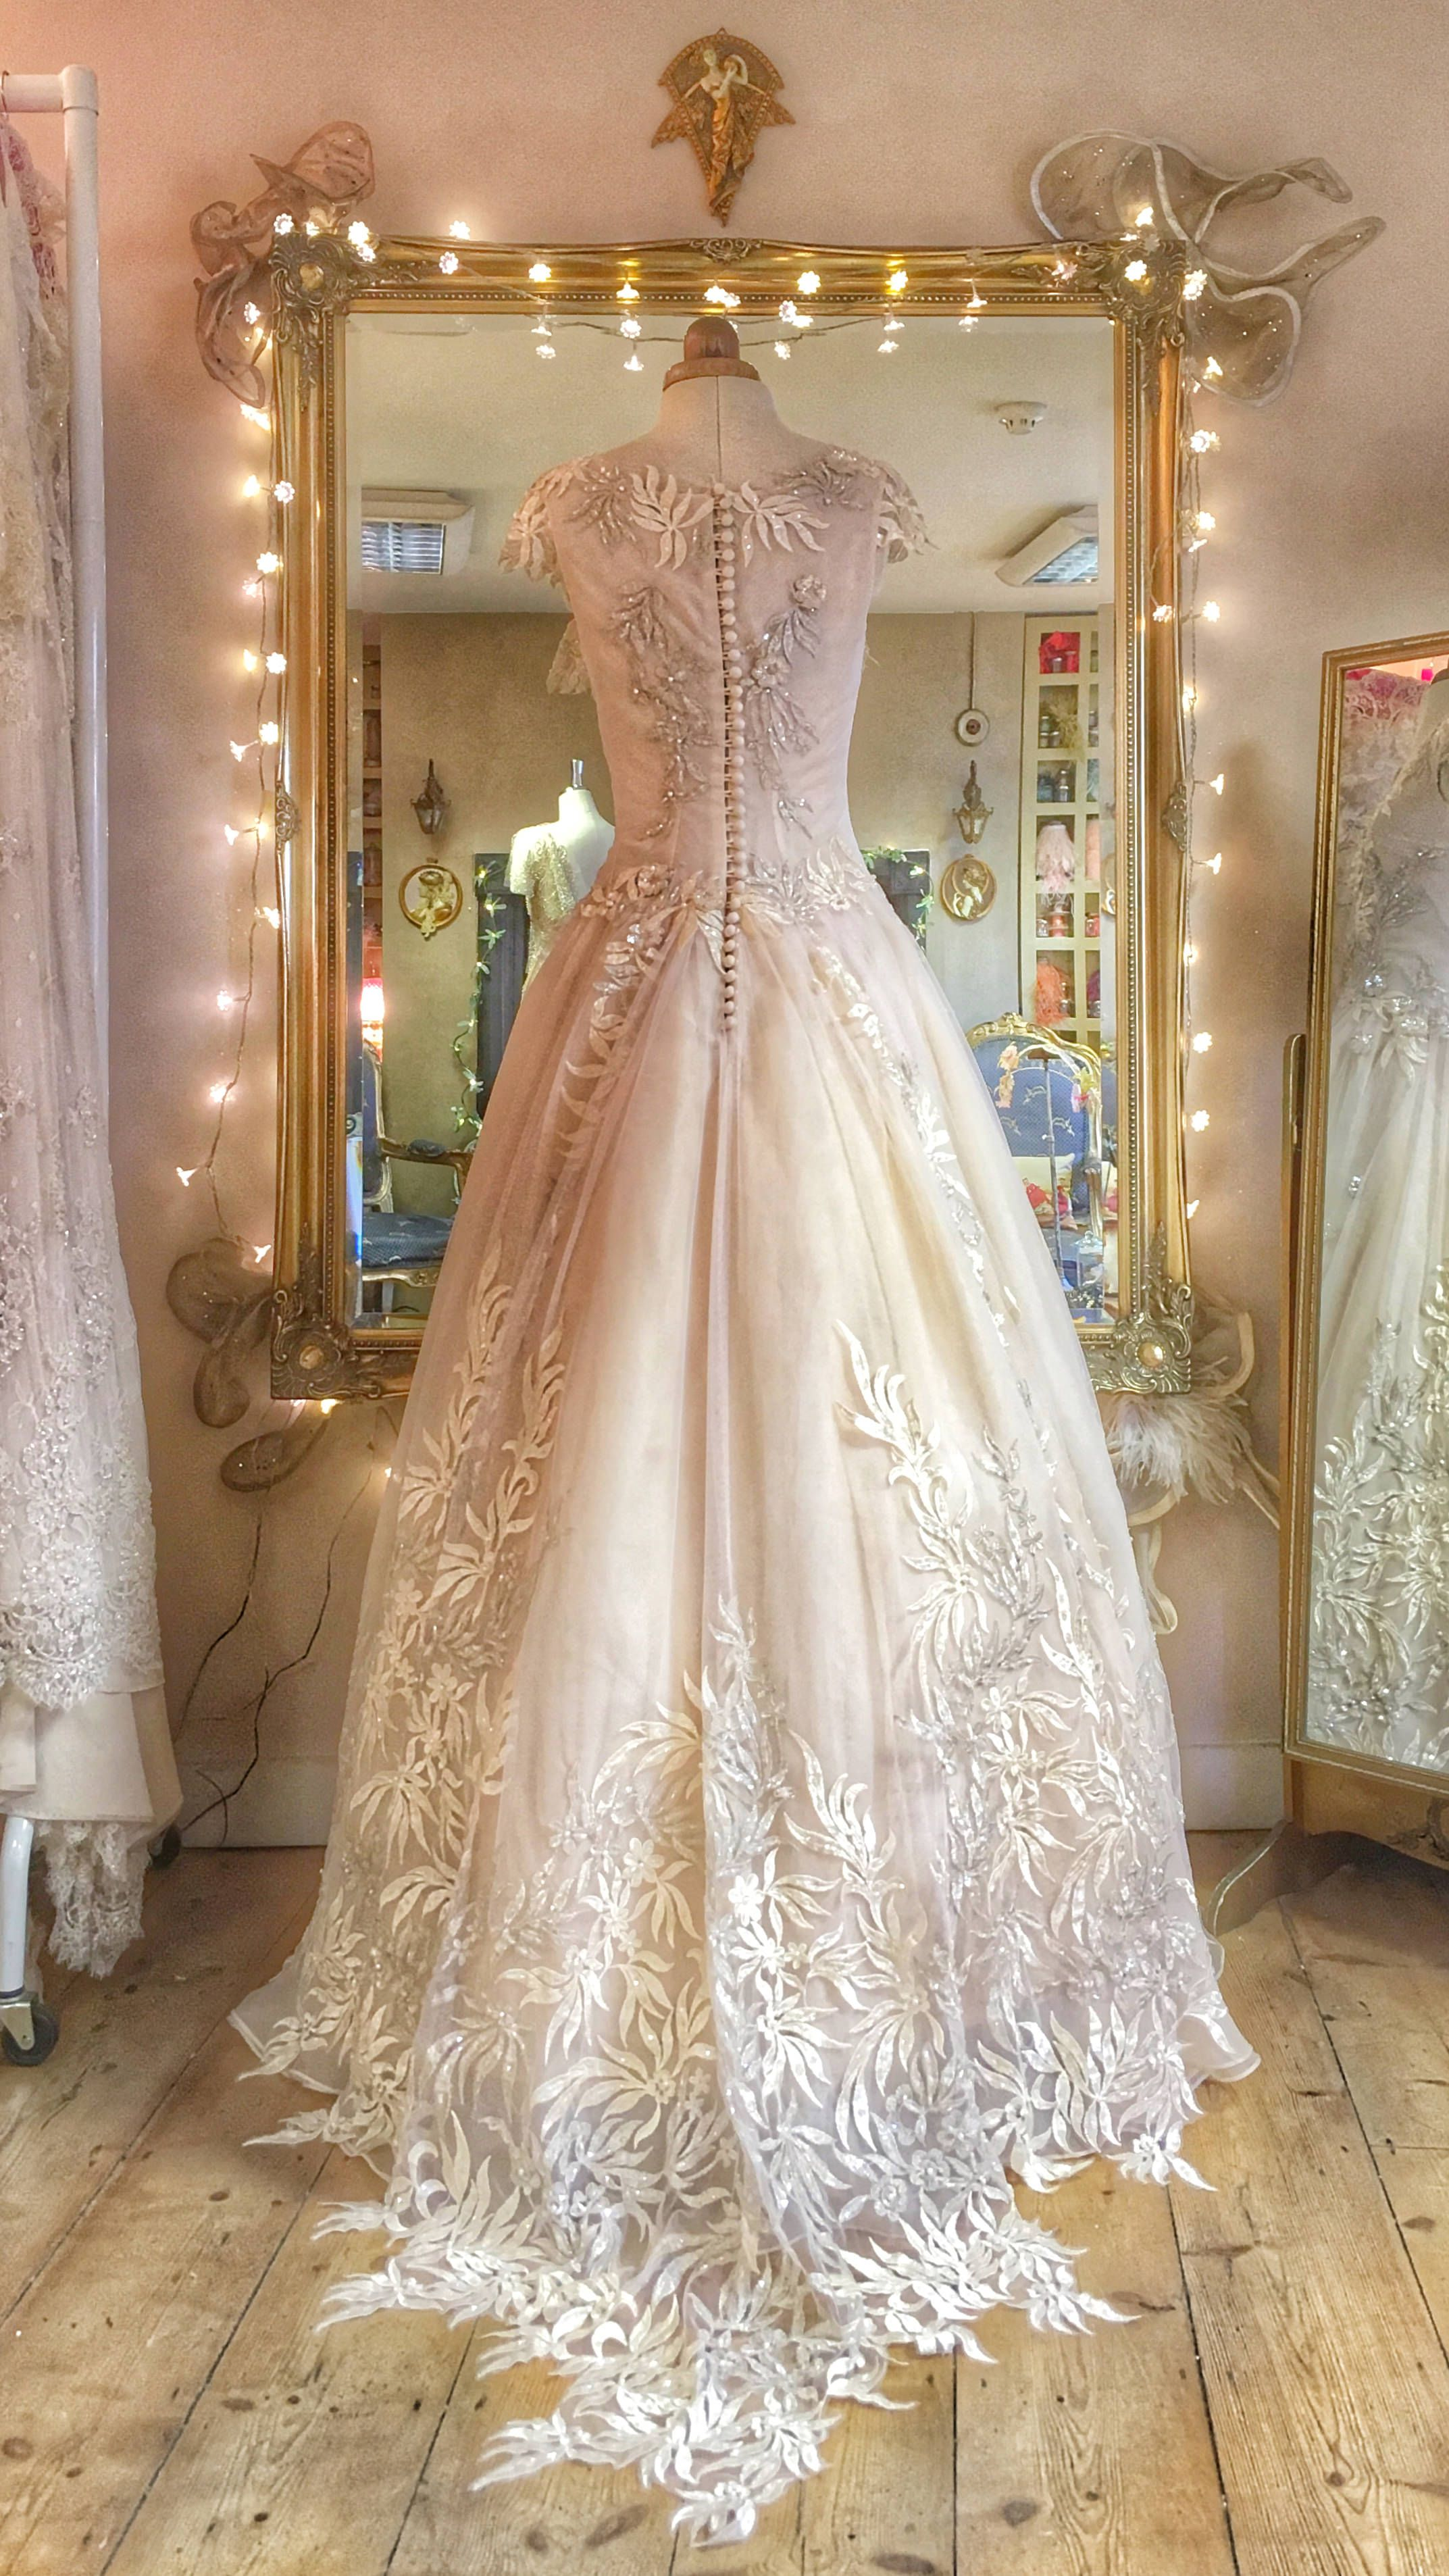 424704c560a Eos  blush pale dogwood embroidered silk organza wedding dress by Joanne  Fleming Design